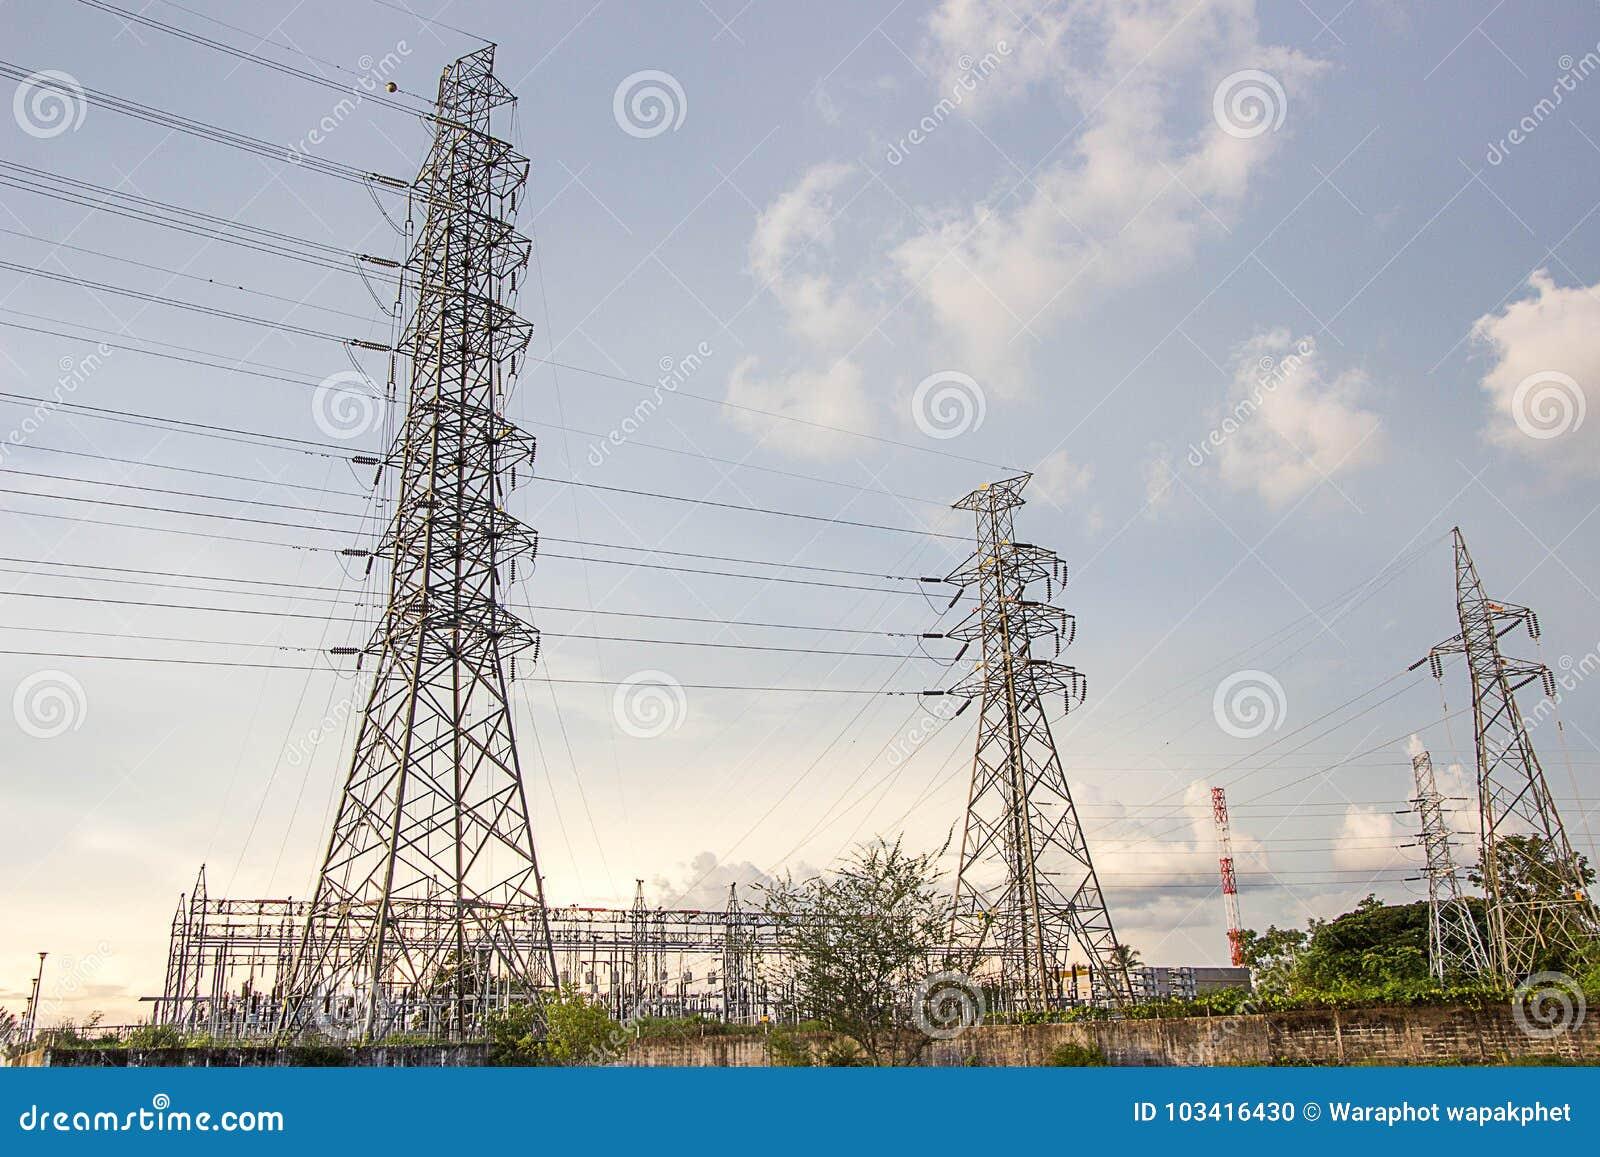 Tower Power Electronics Stock Photo Image Of Background 103416430